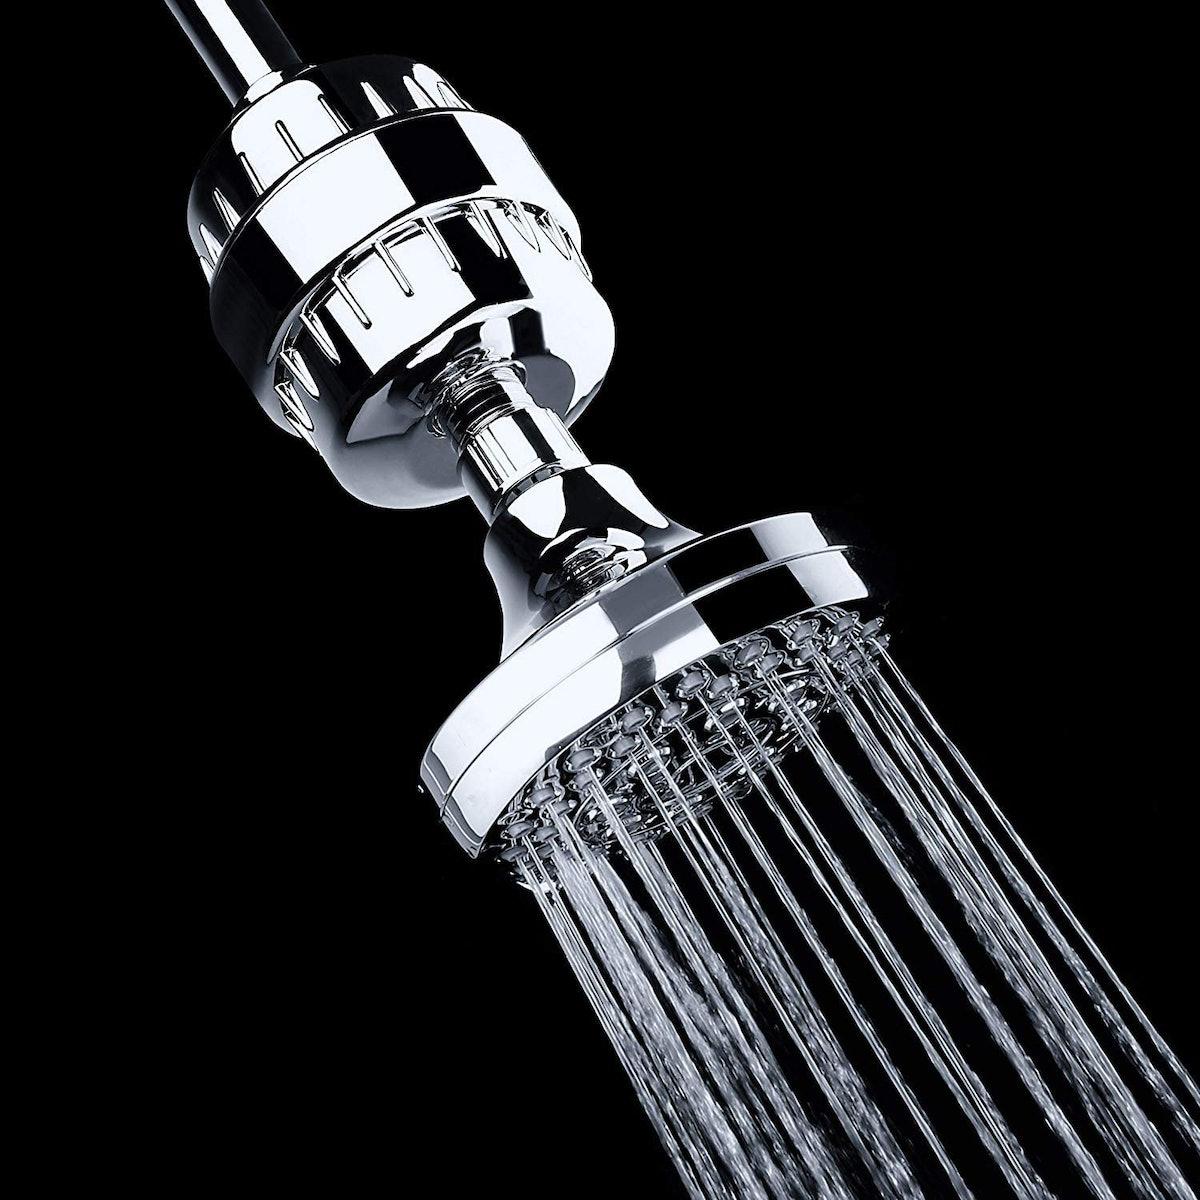 AquaBliss High Output 12-Stage Shower Filter